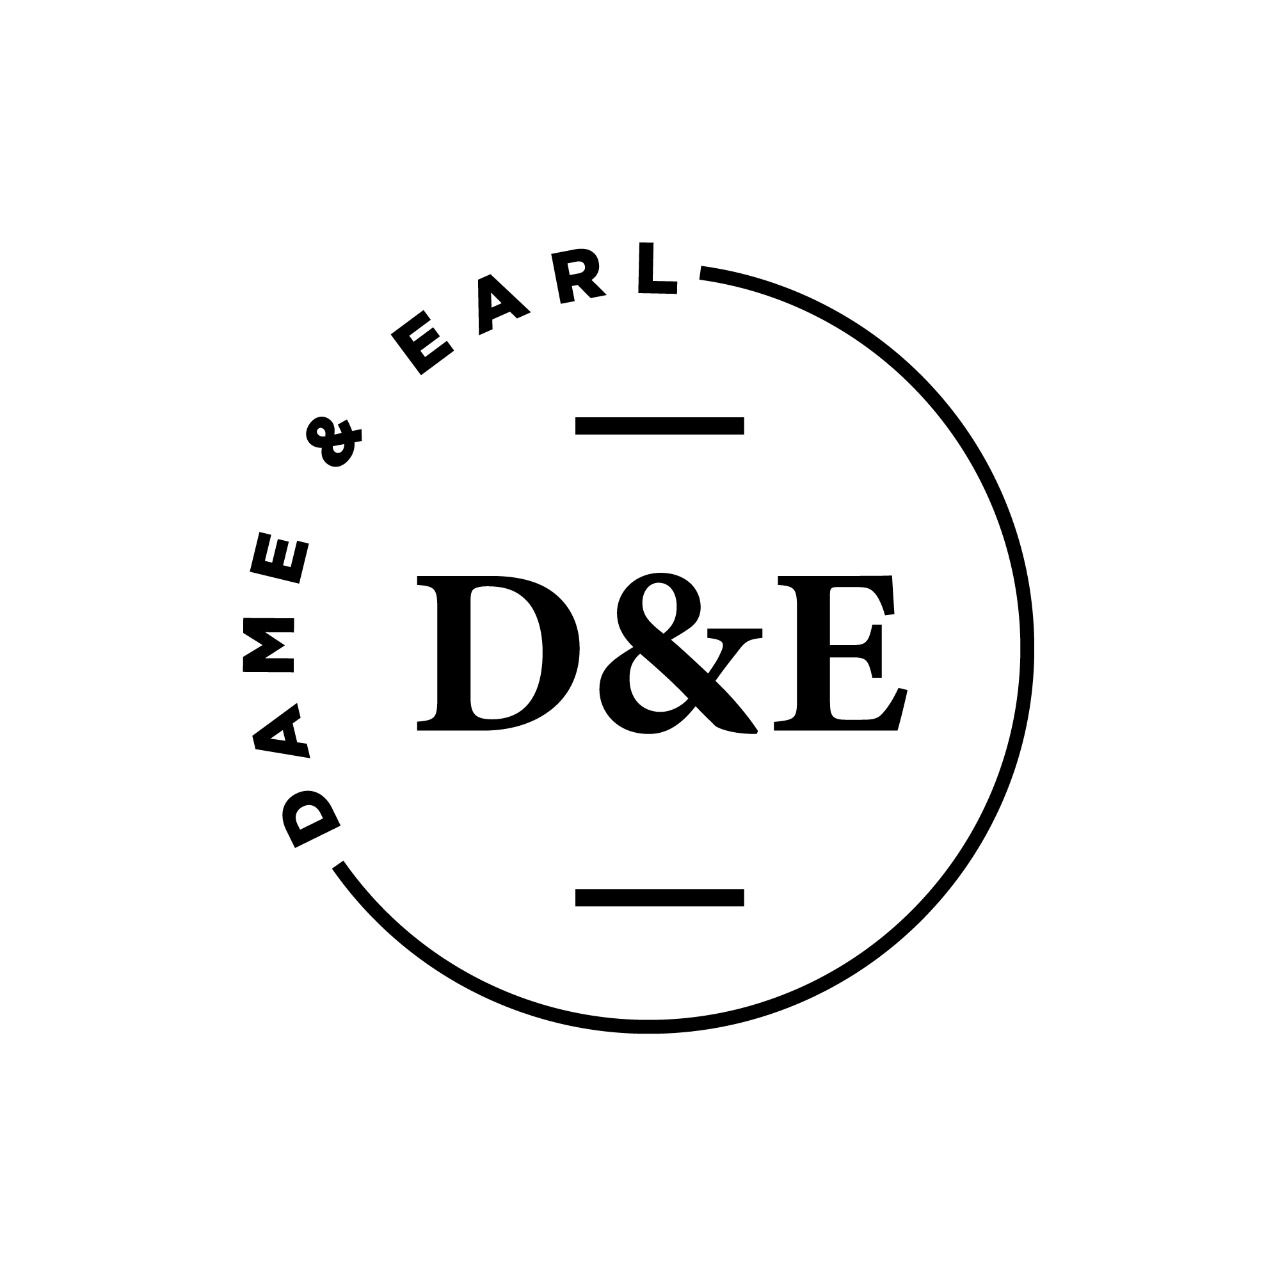 Dame & Earl logo